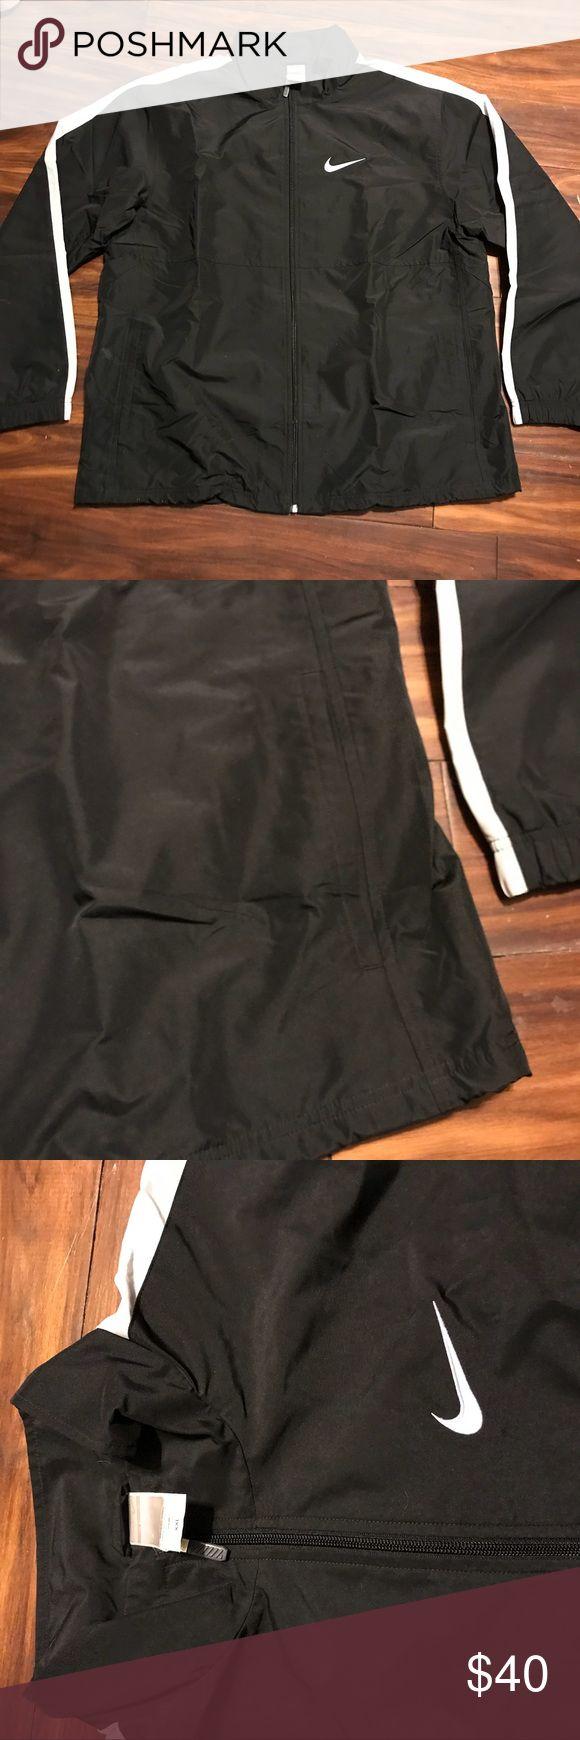 Men's Nike Jacket Black men's Nike waterproof rain coat with white trim. Has pockets.  Men's size XXL, can also fit a women's size 2X. Nike Jackets & Coats